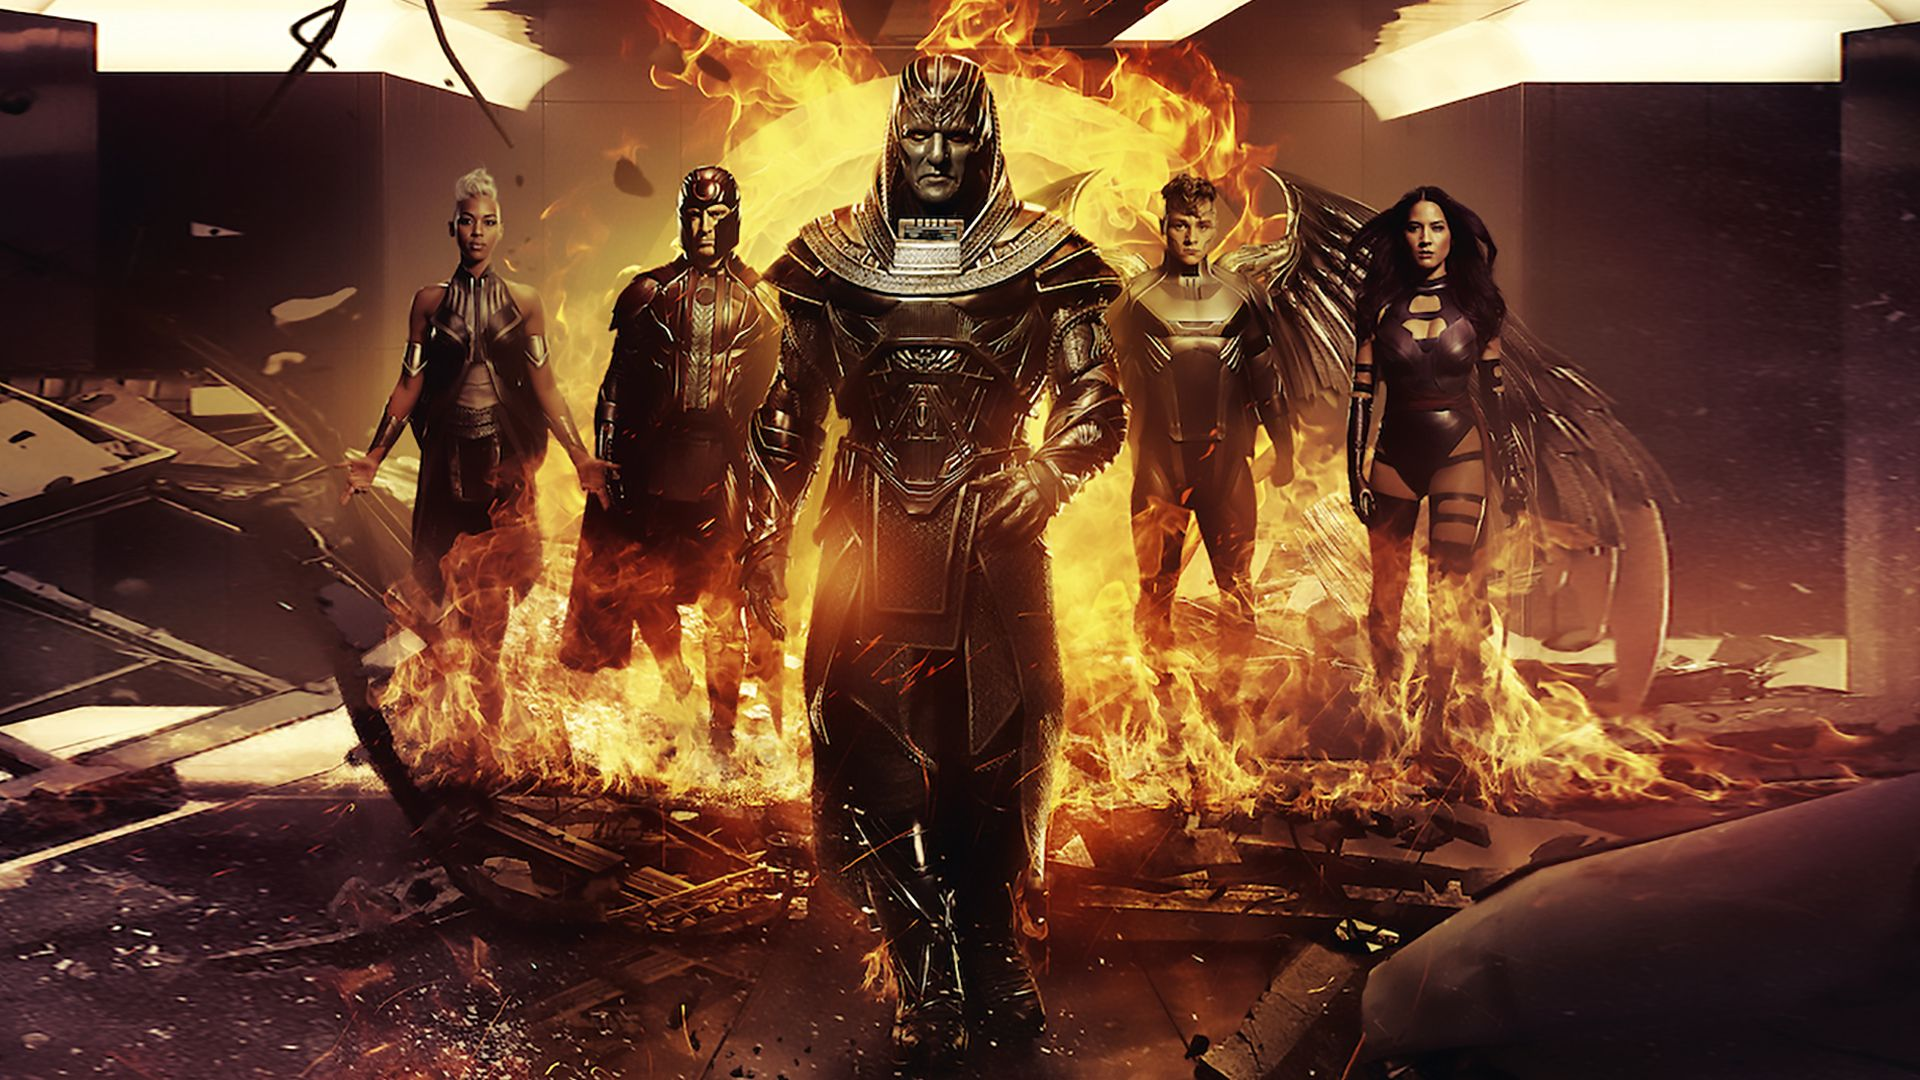 X Men Apocalypse Wallpaper 1920x1080 By Sachso74 On Deviantart X Men Apocalypse X Men Apocalypse